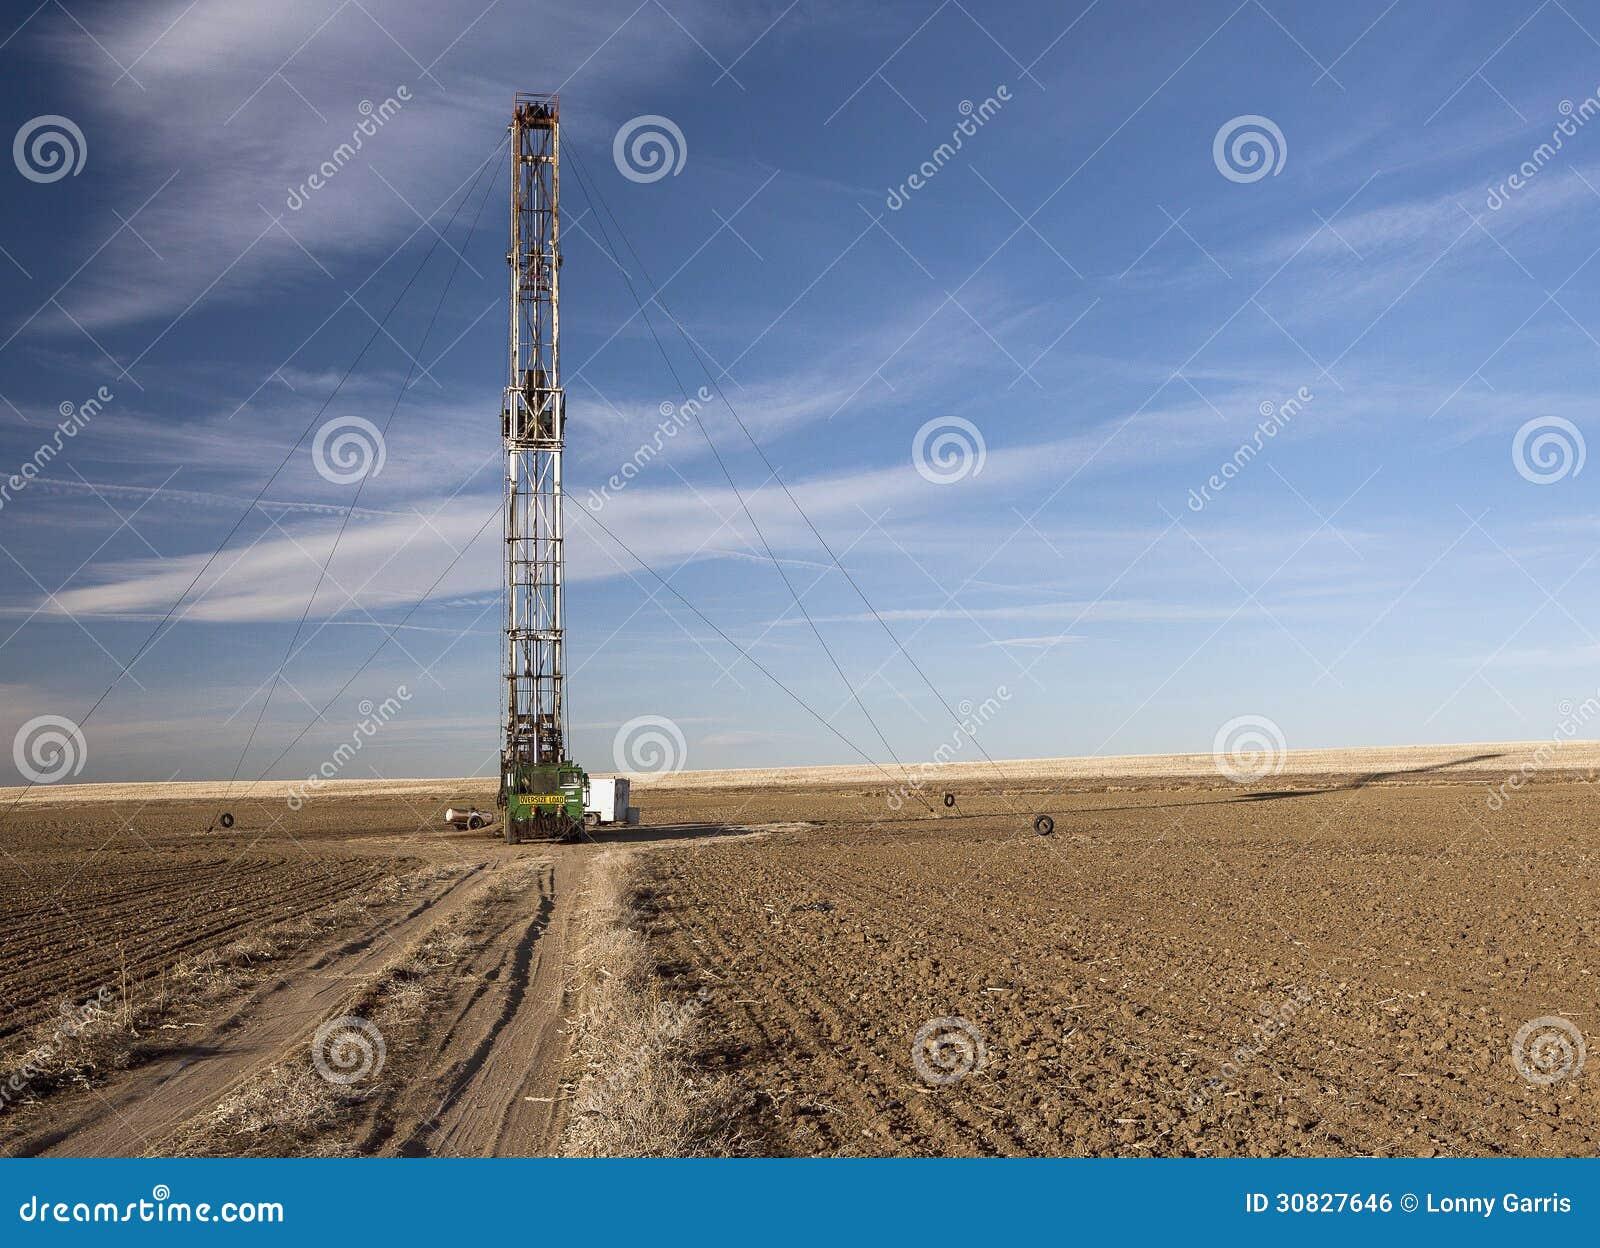 Gas Prices In Colorado >> Fracking Rig In A Colorado Farm Field Stock Photo - Image ...